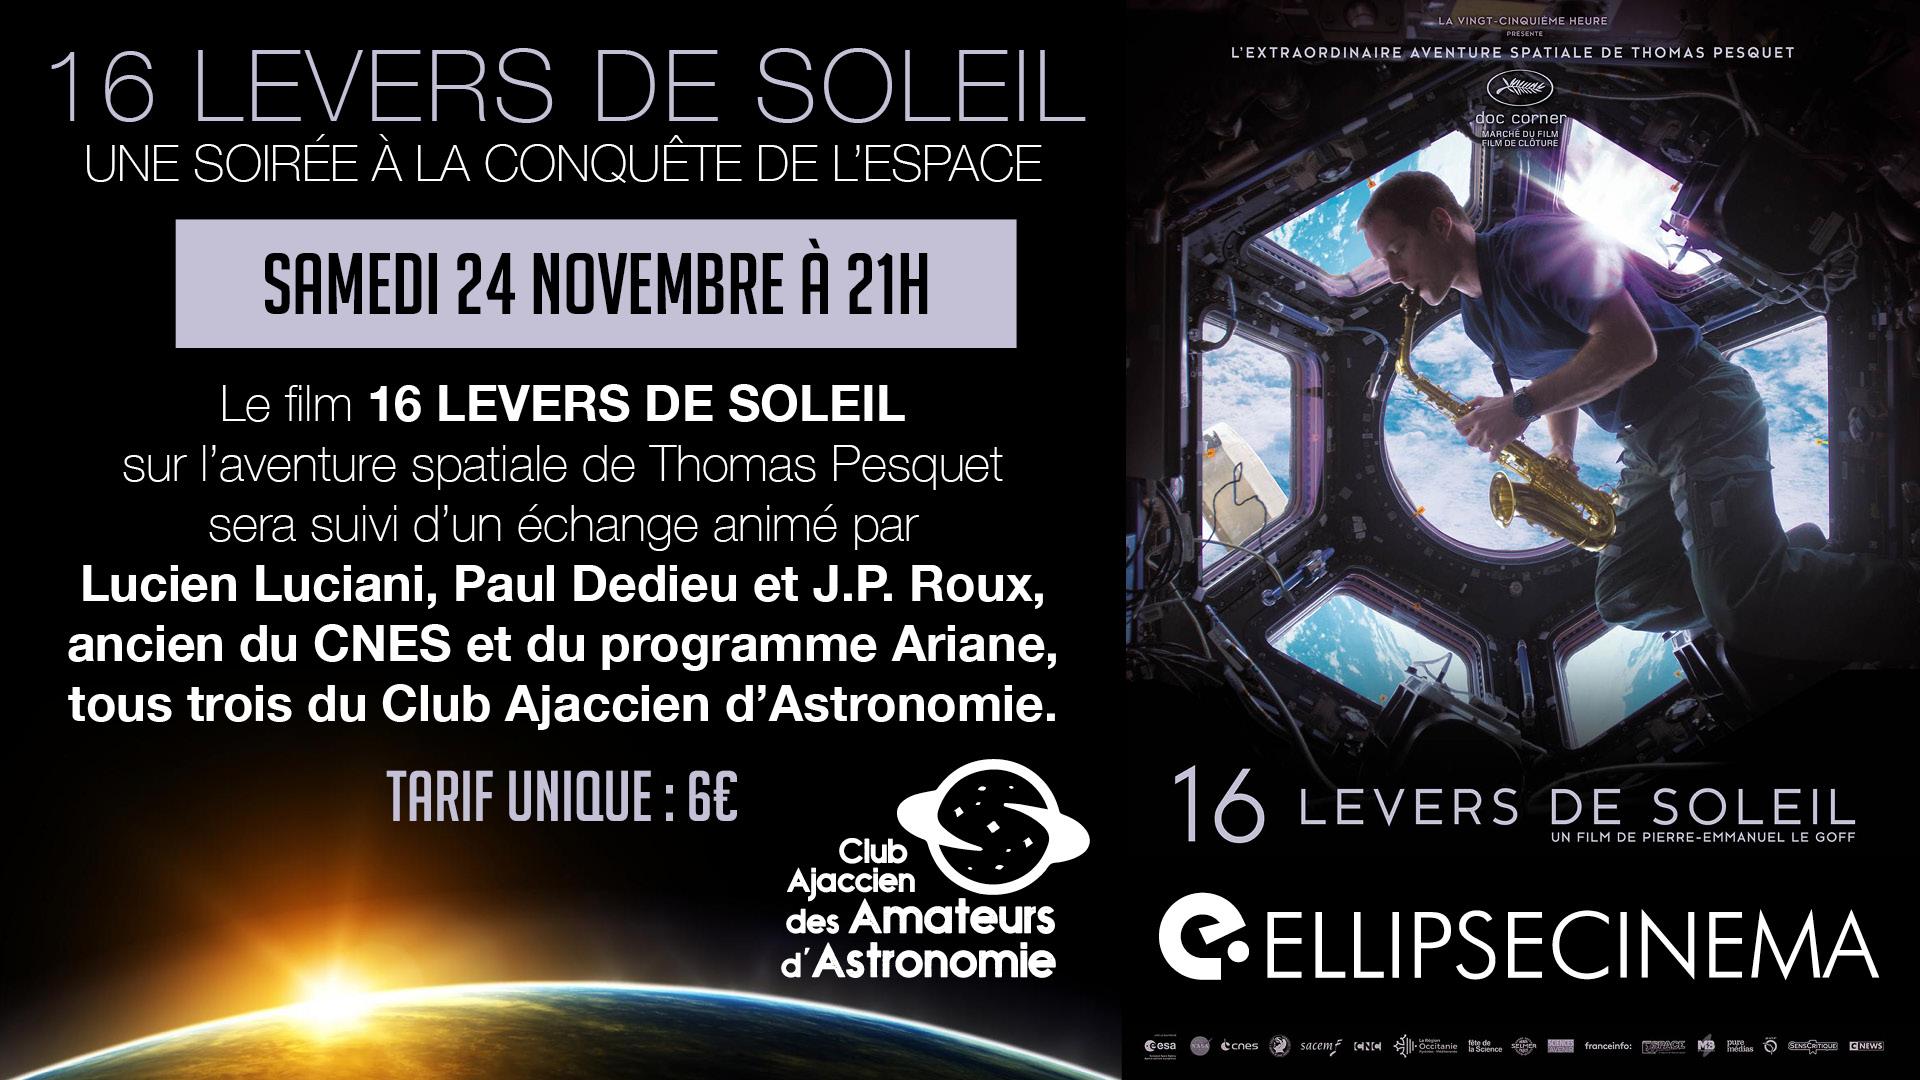 flyer cinéma Ellipse